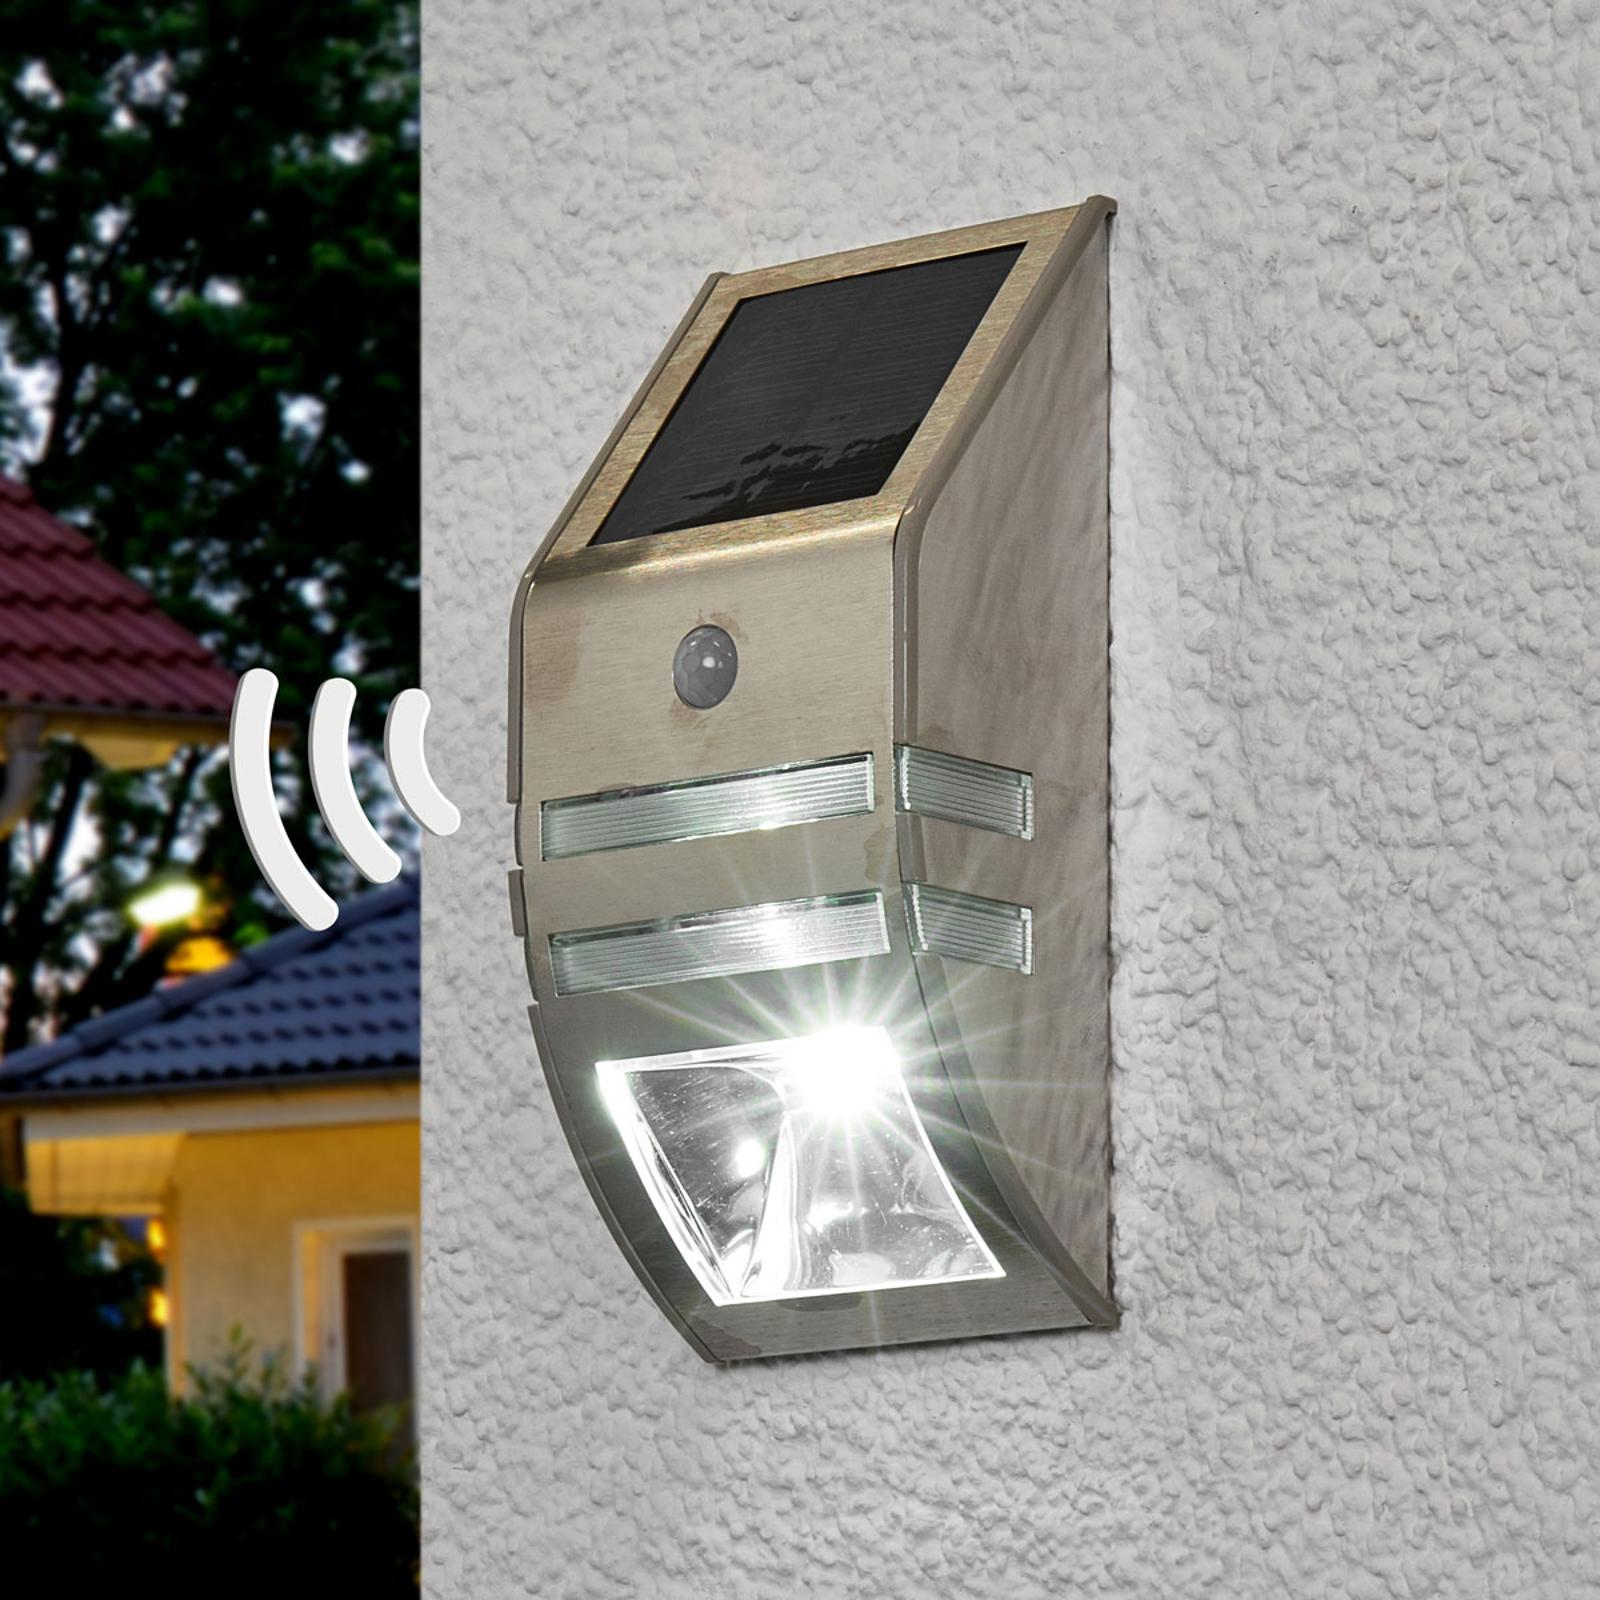 Lampa solarna ścienna LED Sol WL-2007 z cz. ruchu